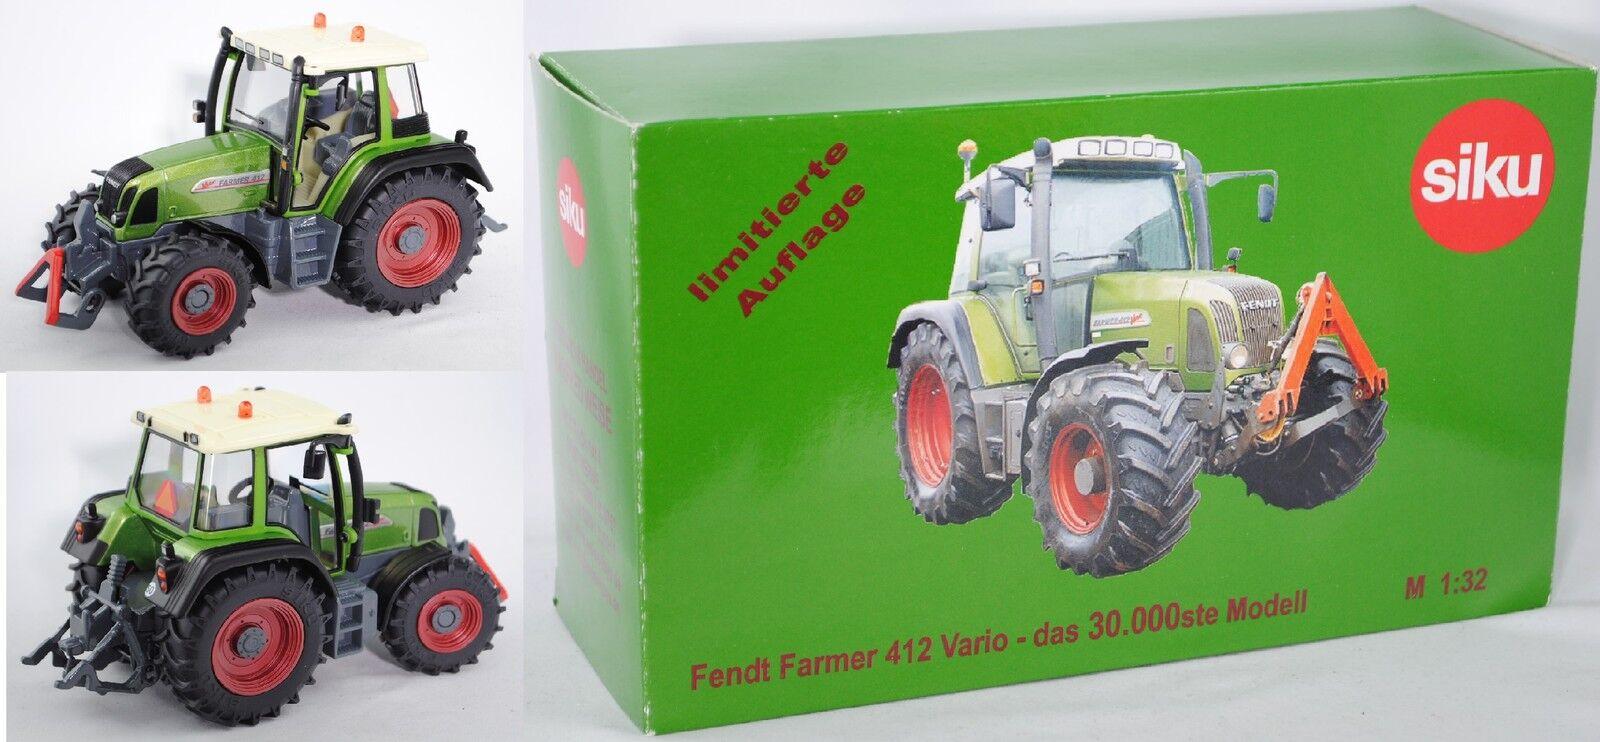 SIKU FARMER 2968 fendt farmer 412 Vario  30.000ste modèle  1 32 Modèle Spécial